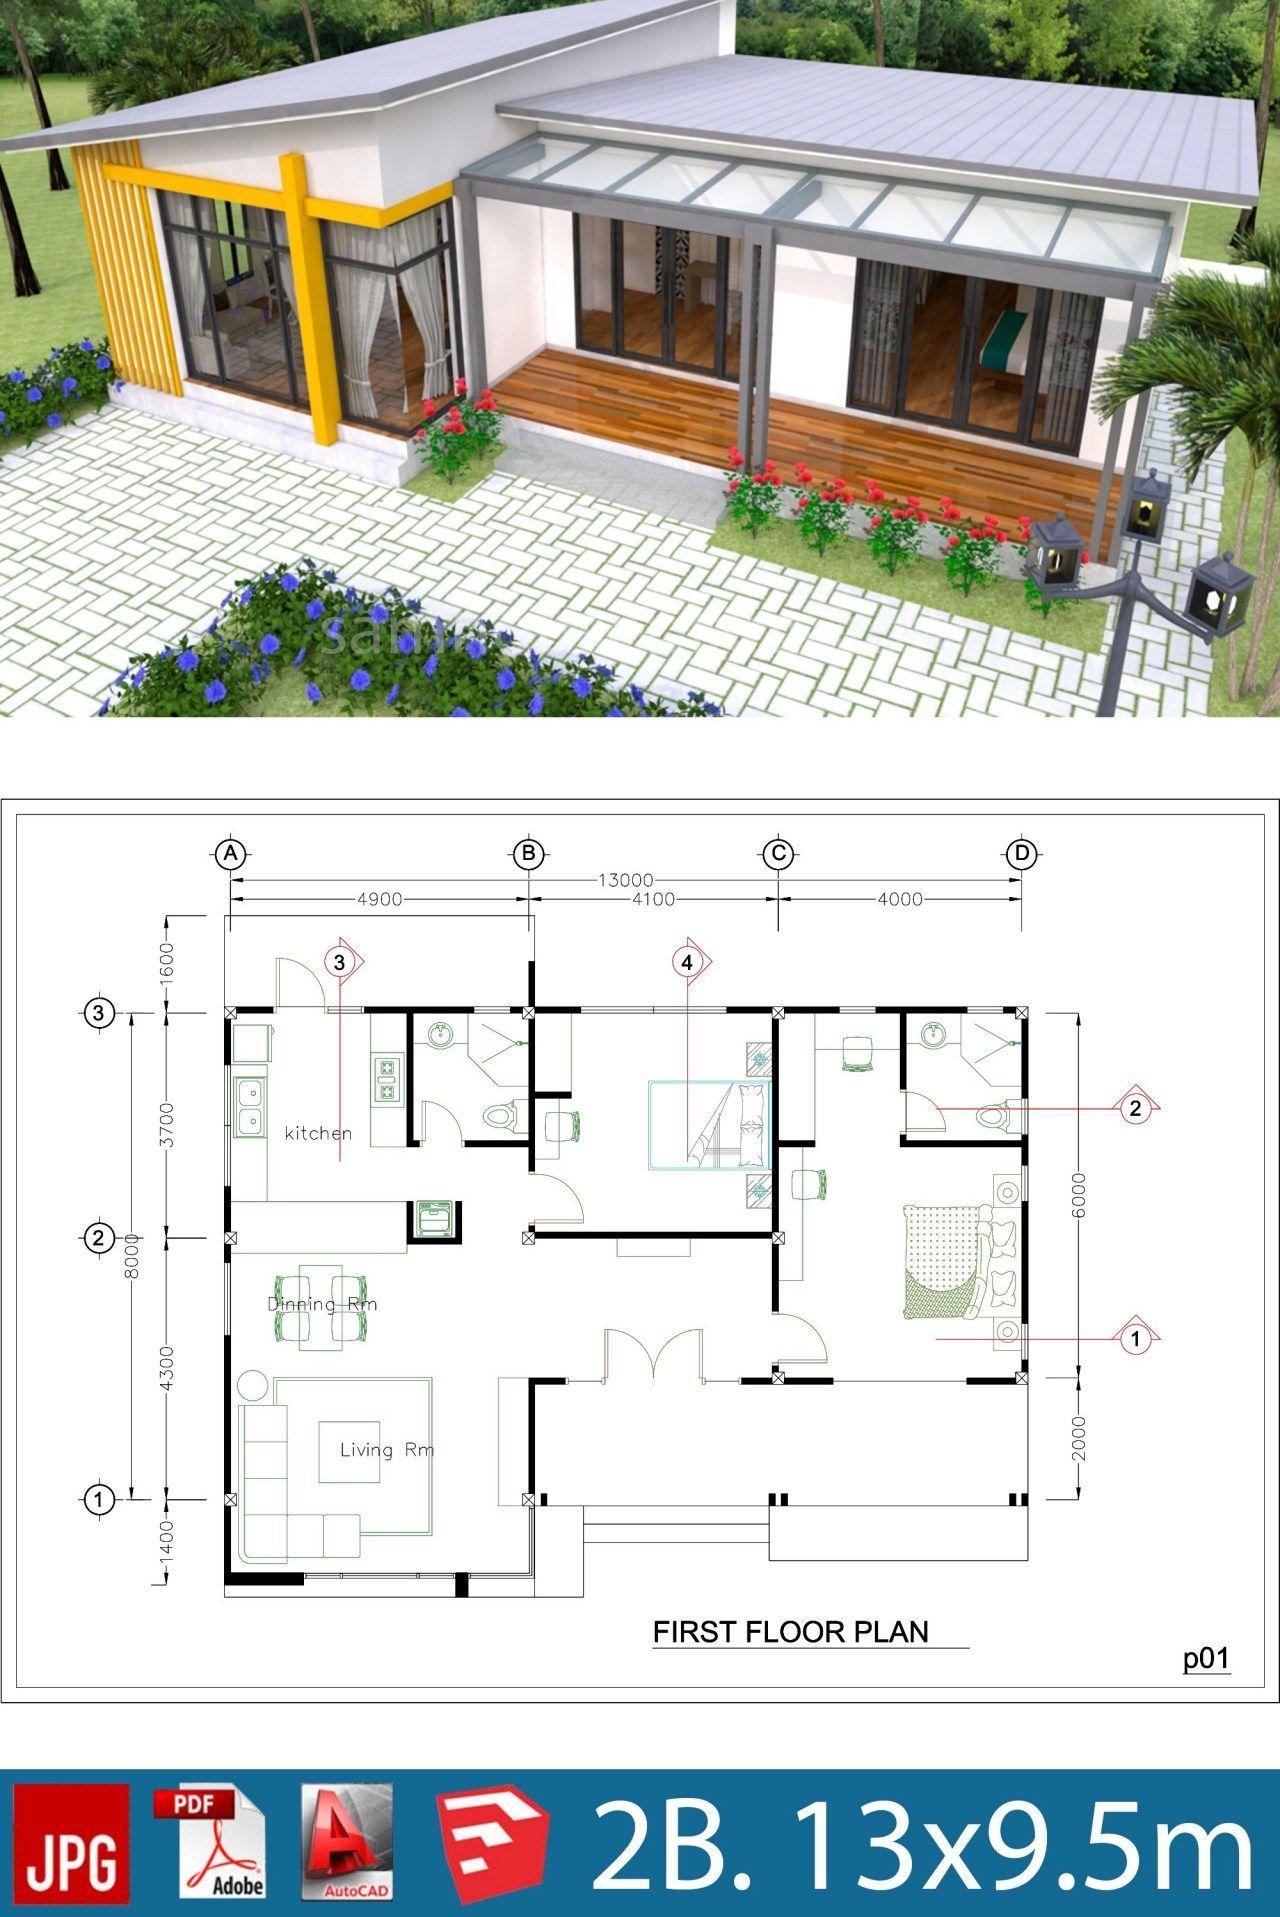 Plan 3d Interior Design House Plans 13x9 5m Full Plan 3beds